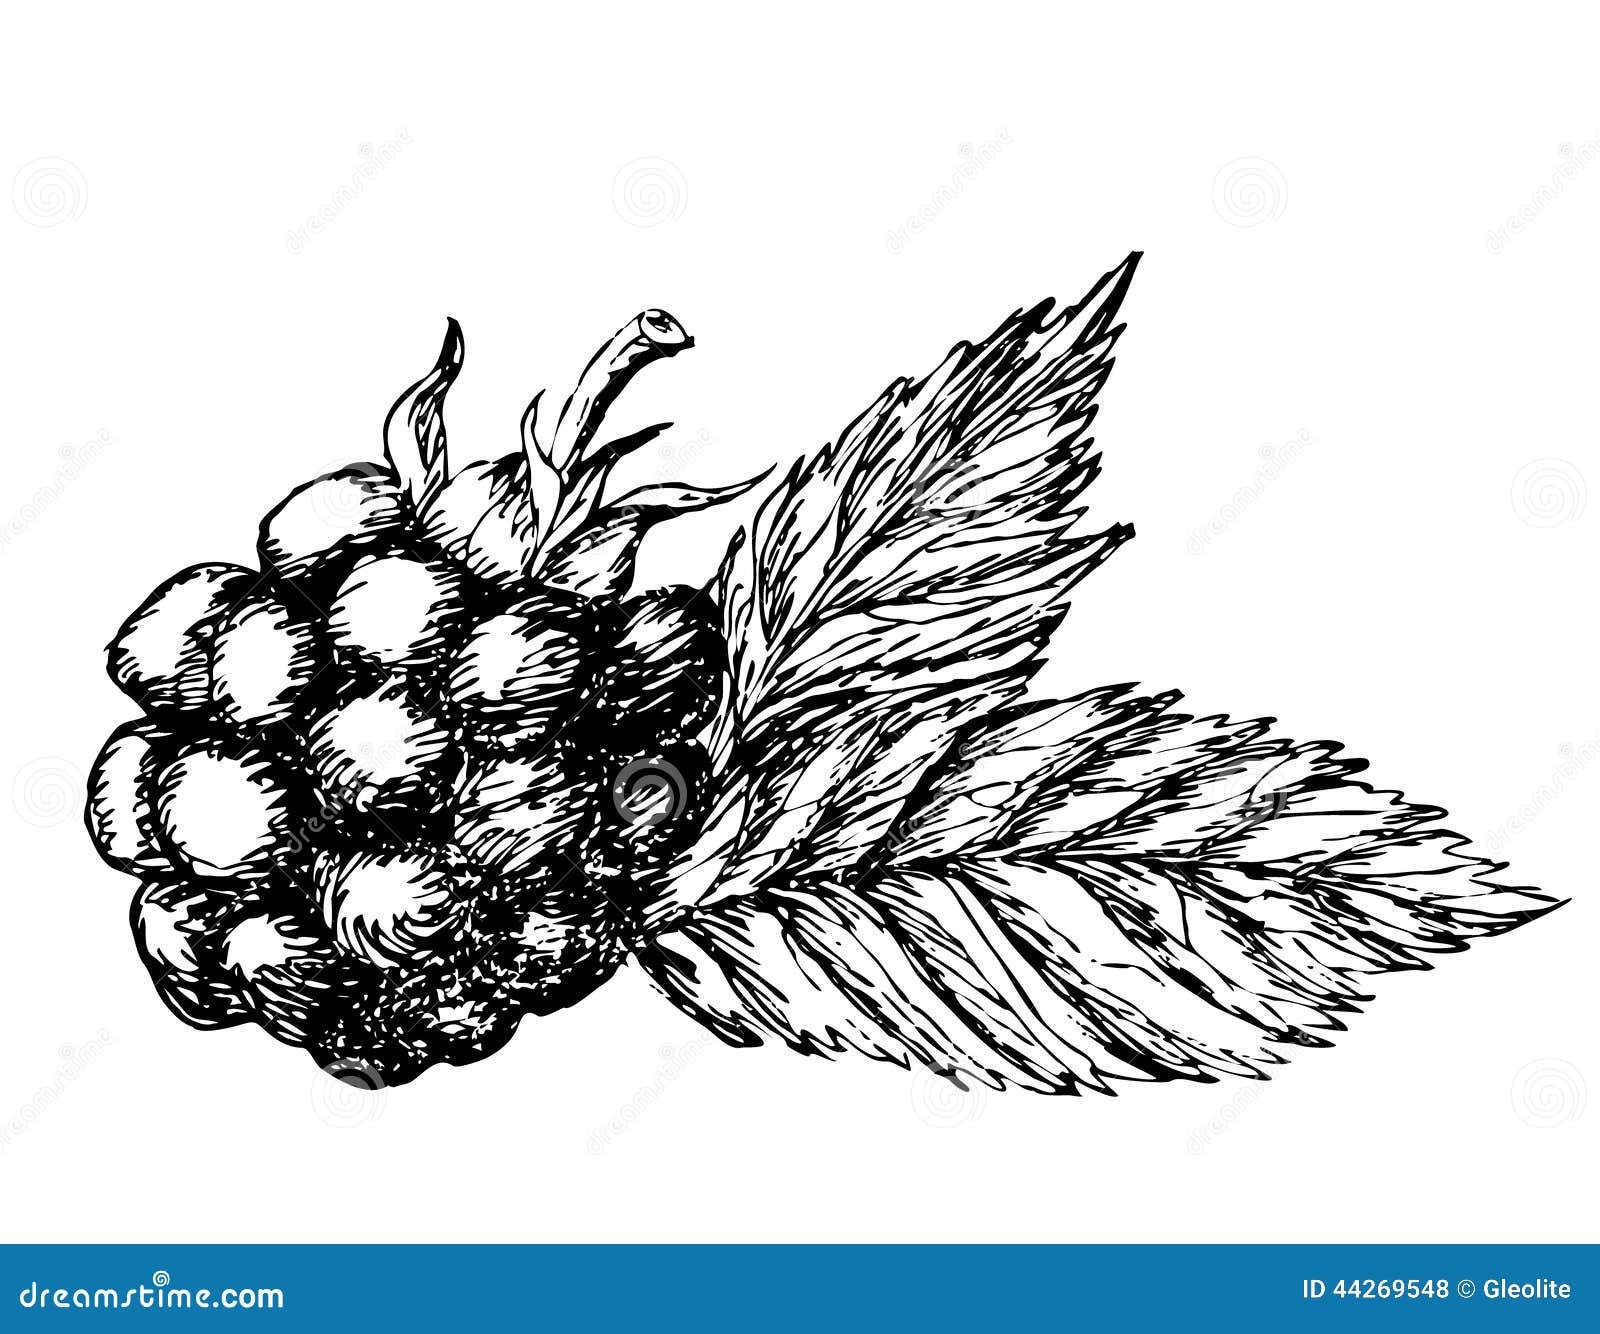 Stock Illustration Blackberry Hand Drawn Sketch Vector Illustration Image44269548 on Healthy Food Fruit